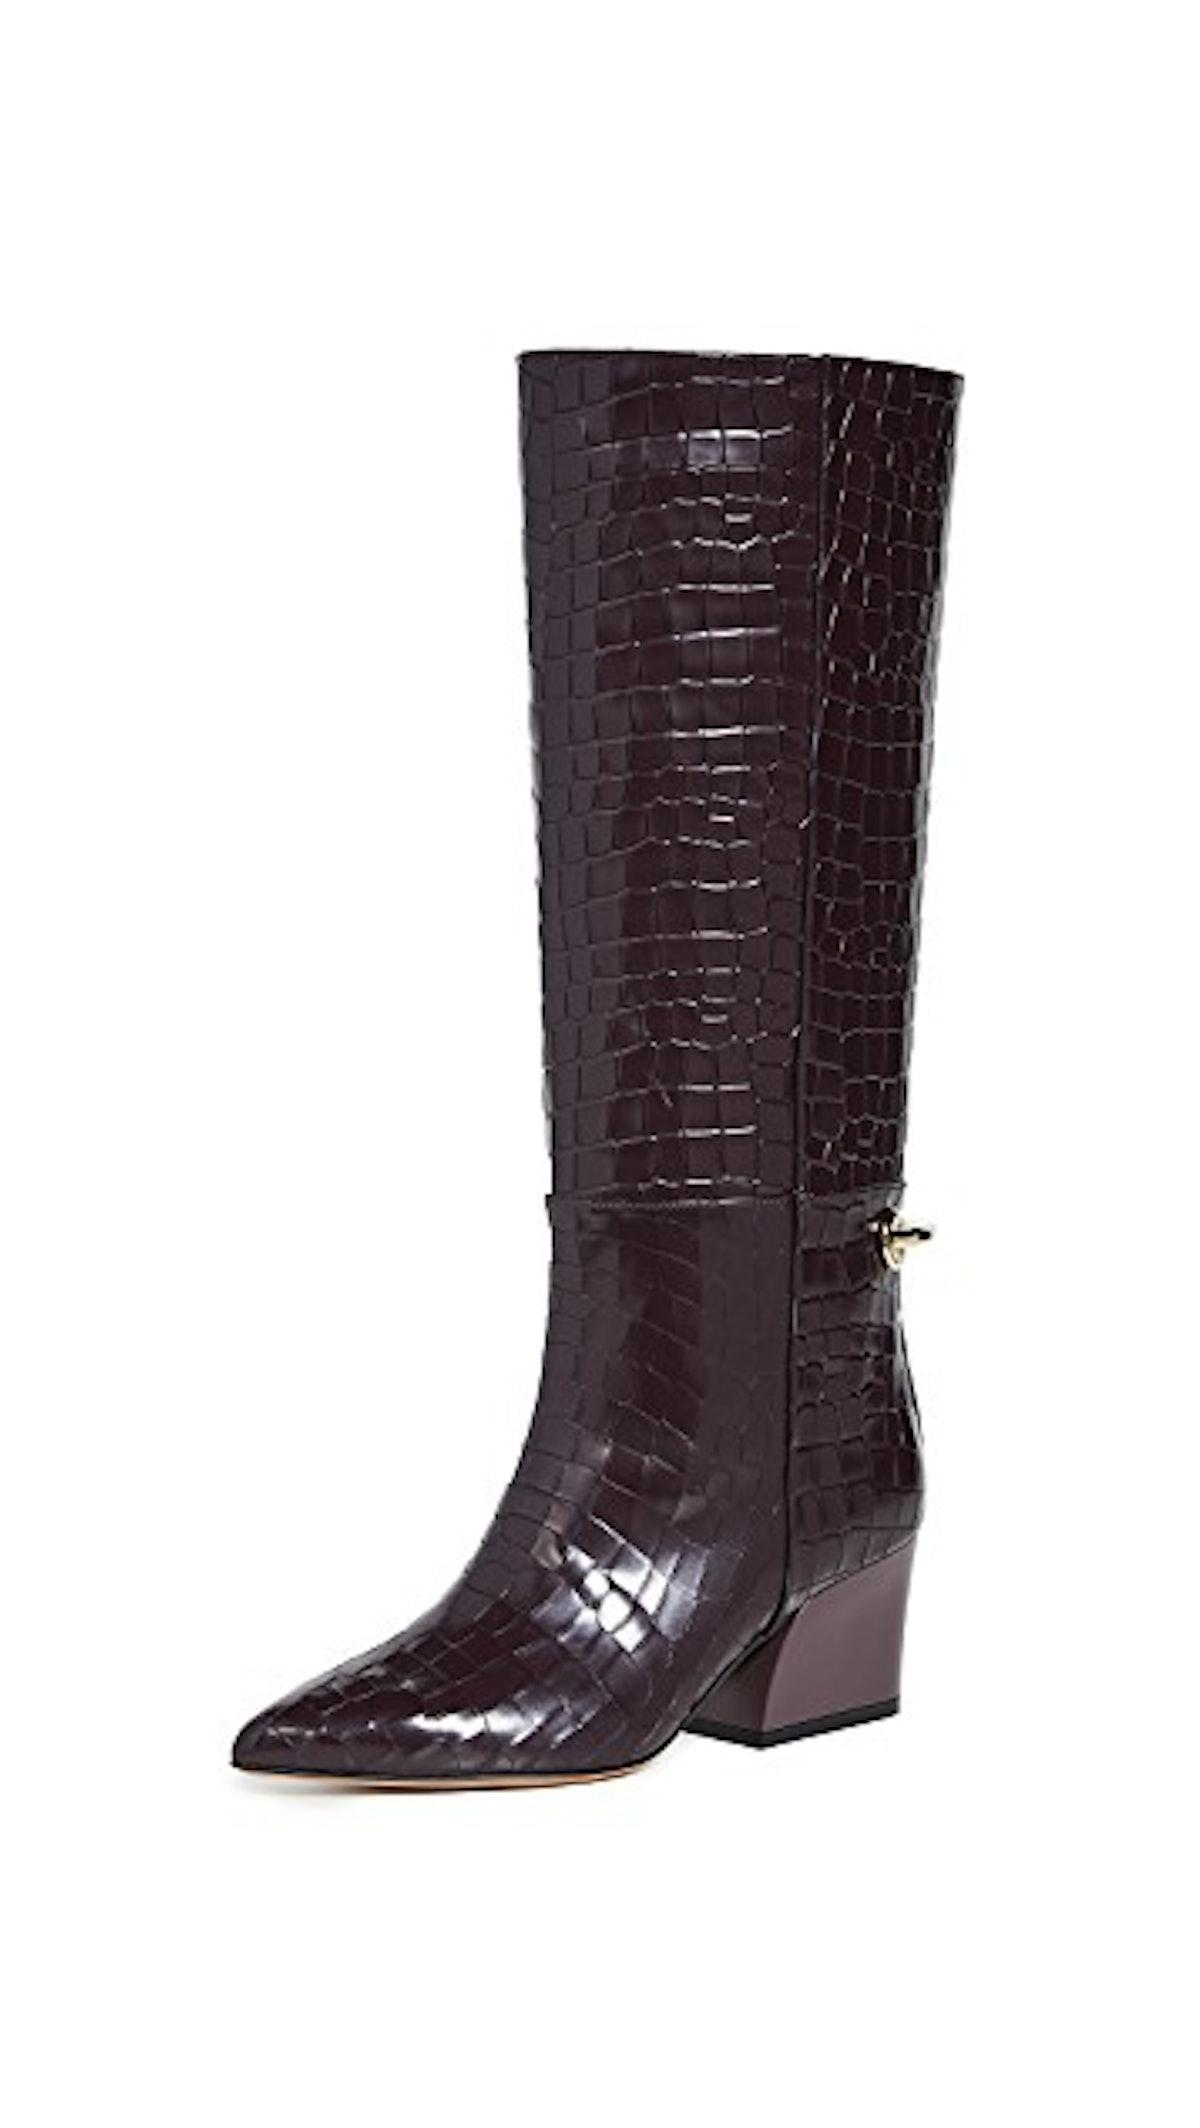 Prune Rowan Boots